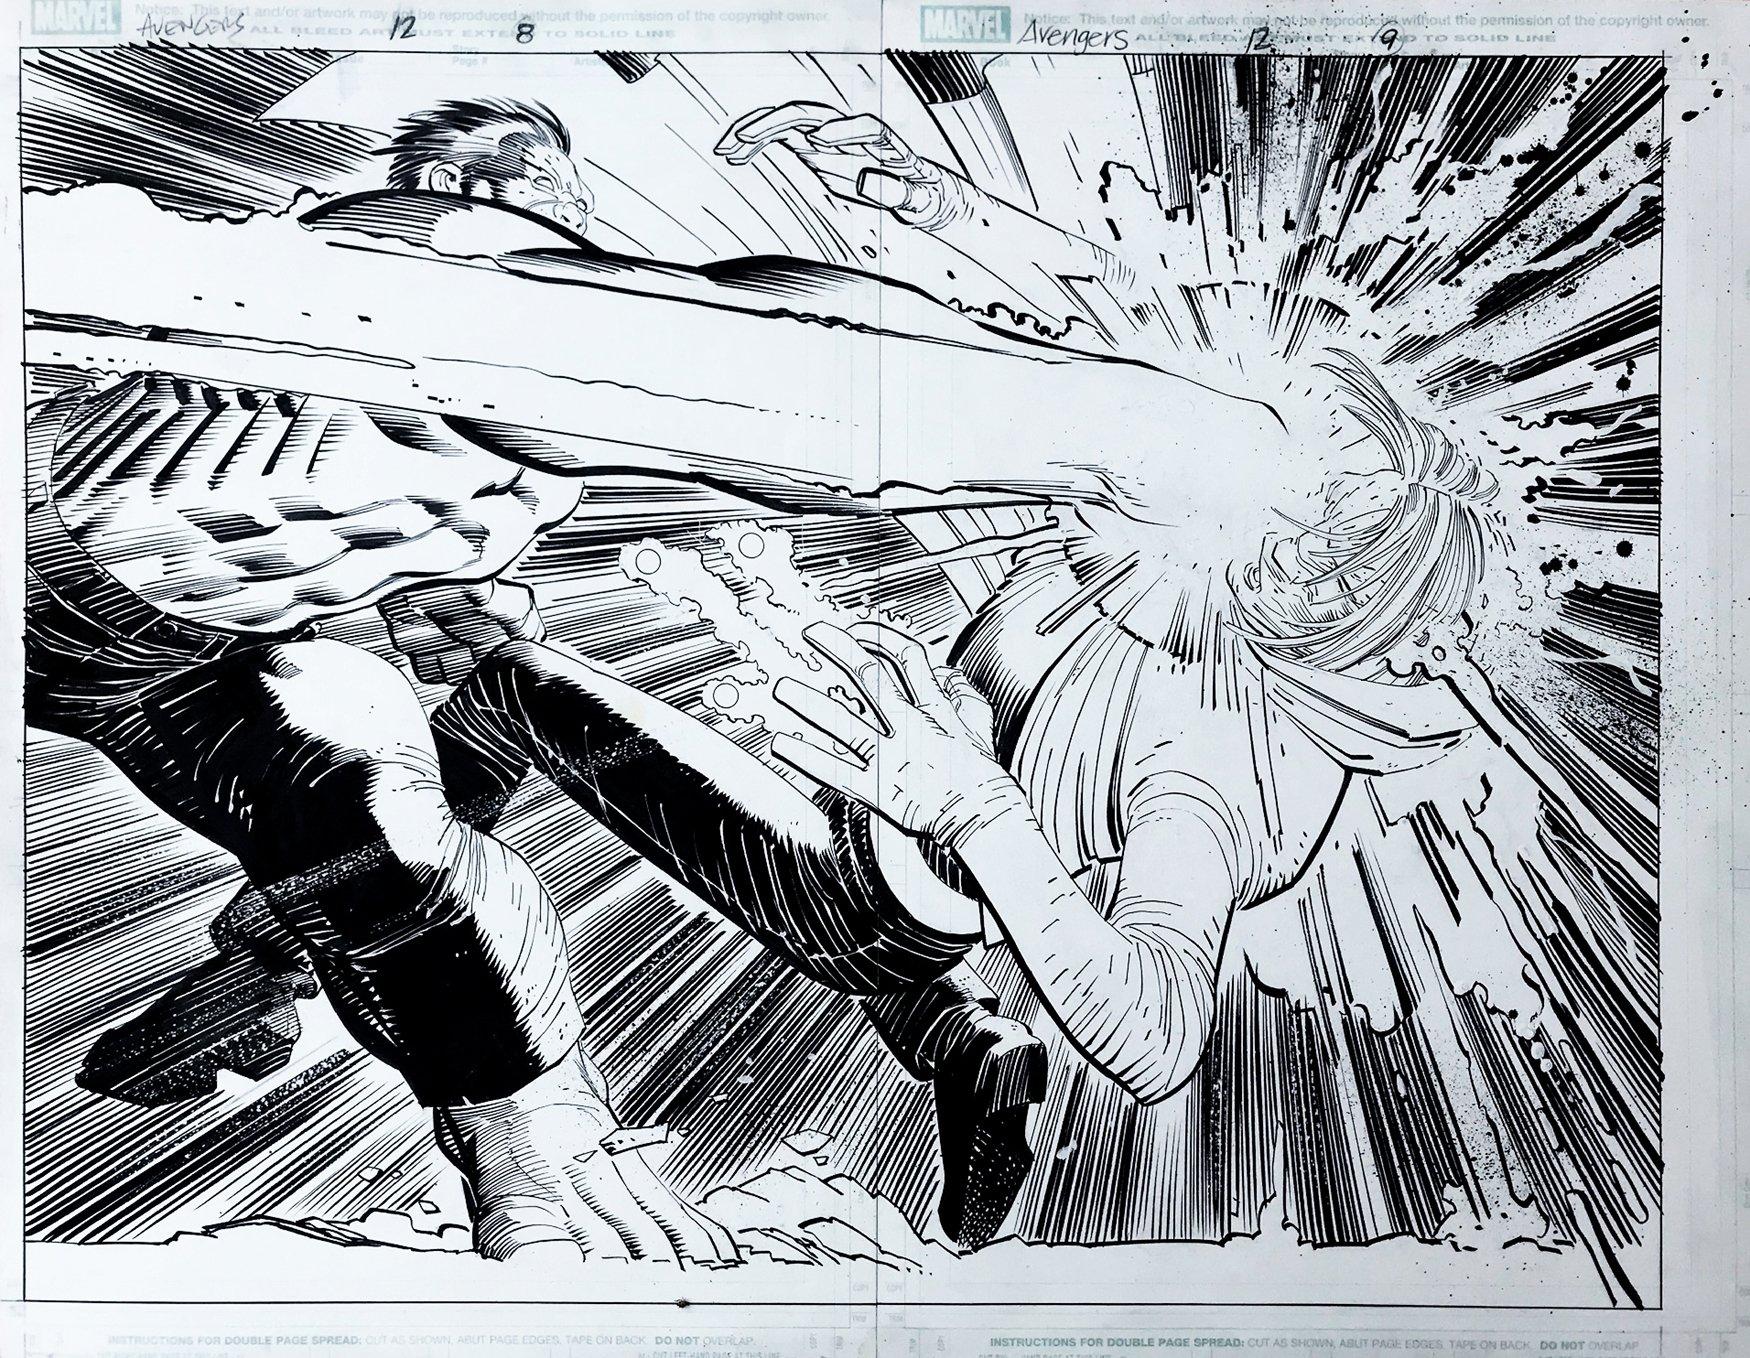 Avengers #12 p 8-9 DOUBLE SPLASH (HULK SMASHES...THE HOOD!) 2011